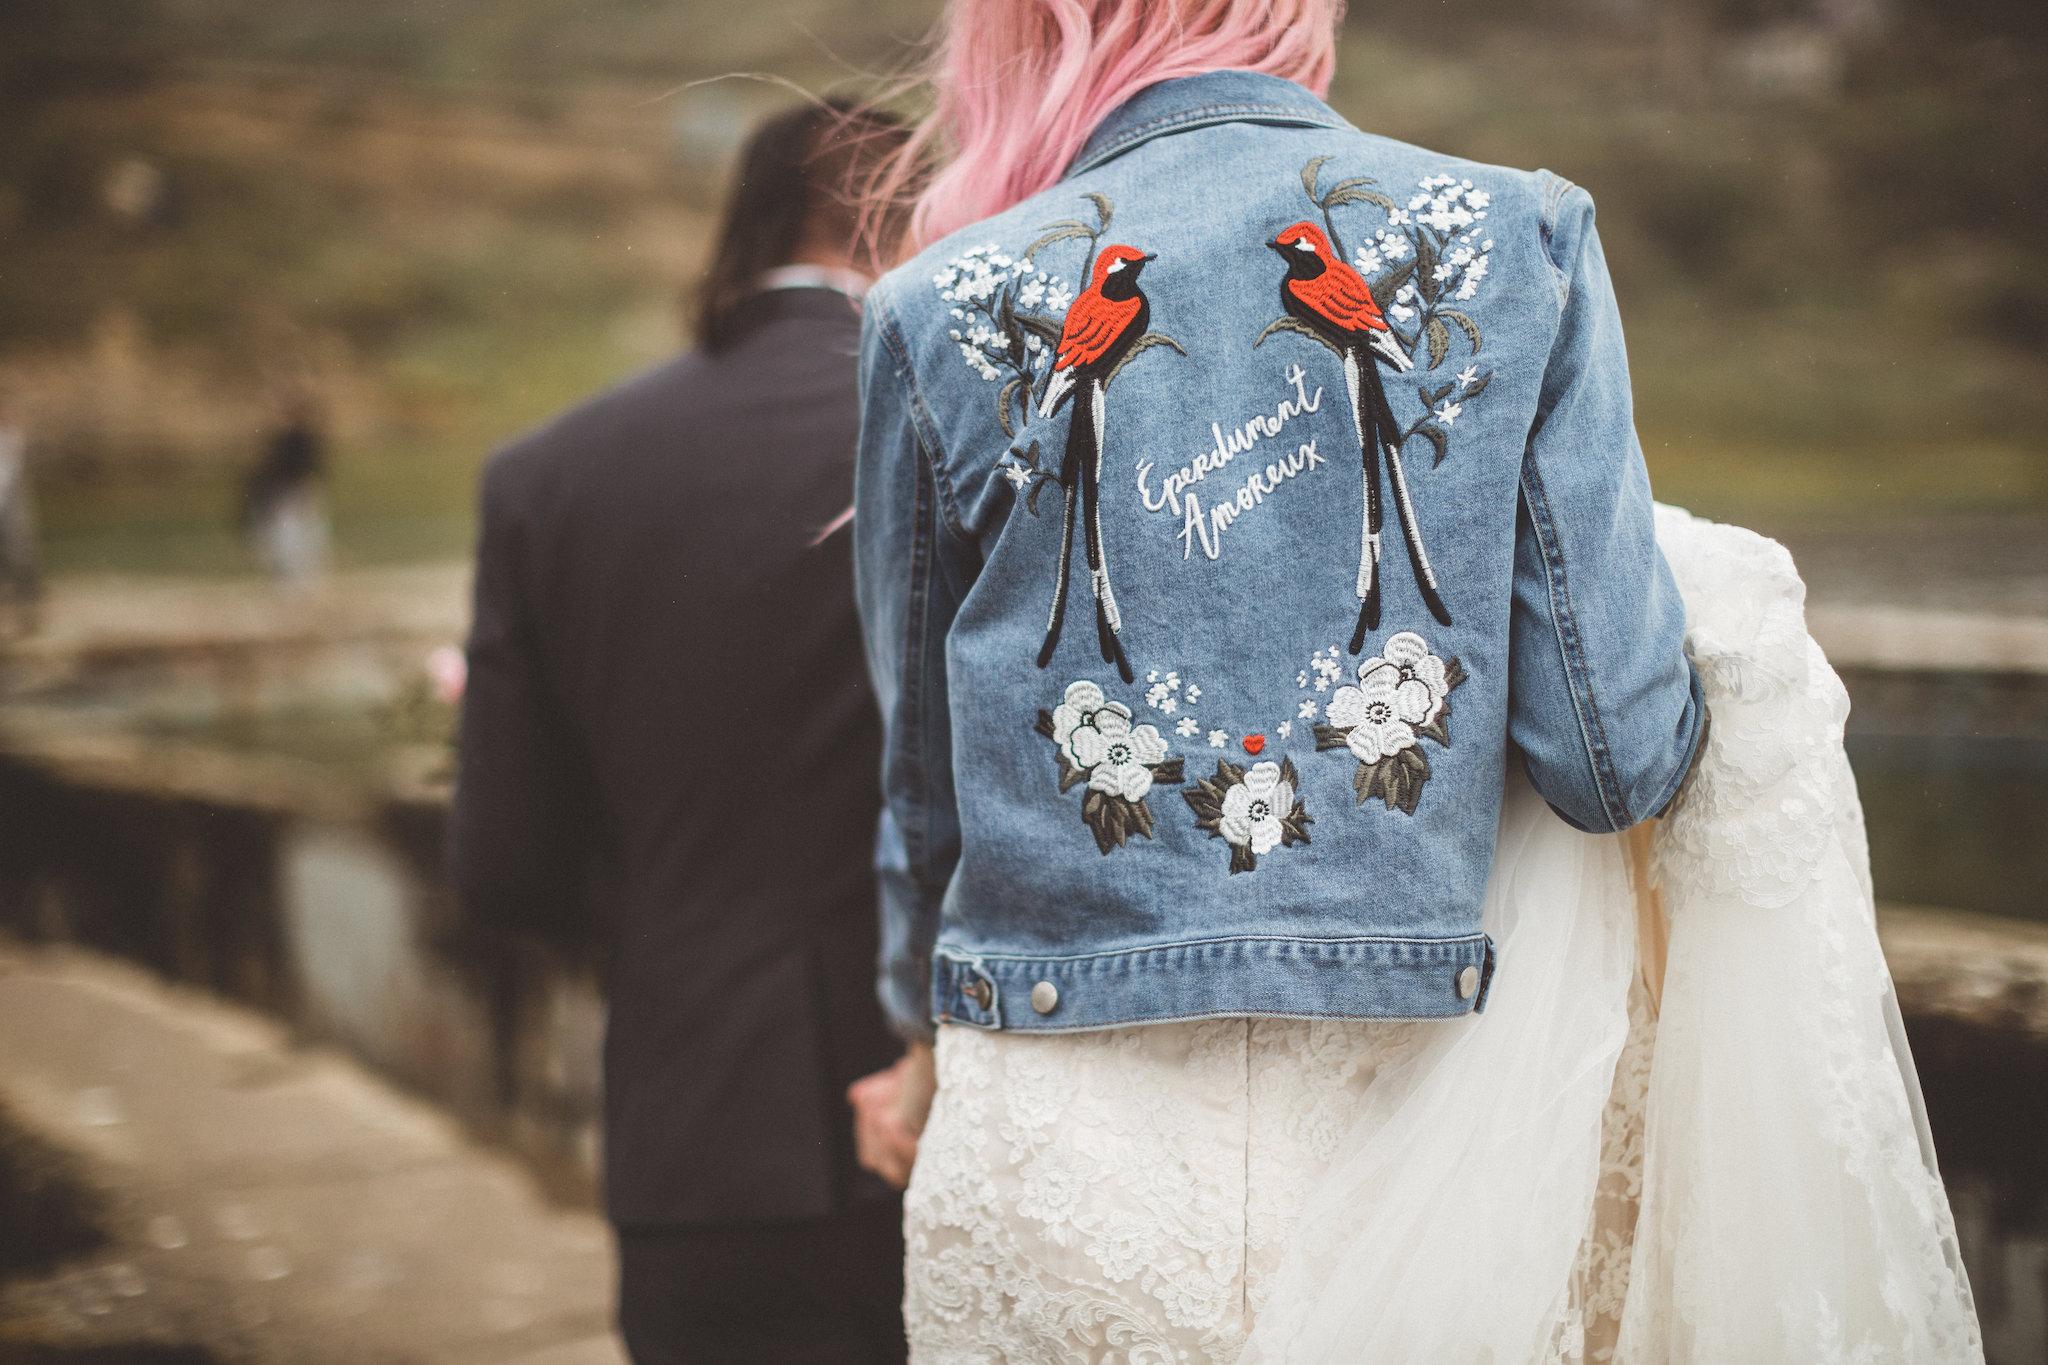 kris-and-andreas-san-francisco-elopement-adventure72.jpg